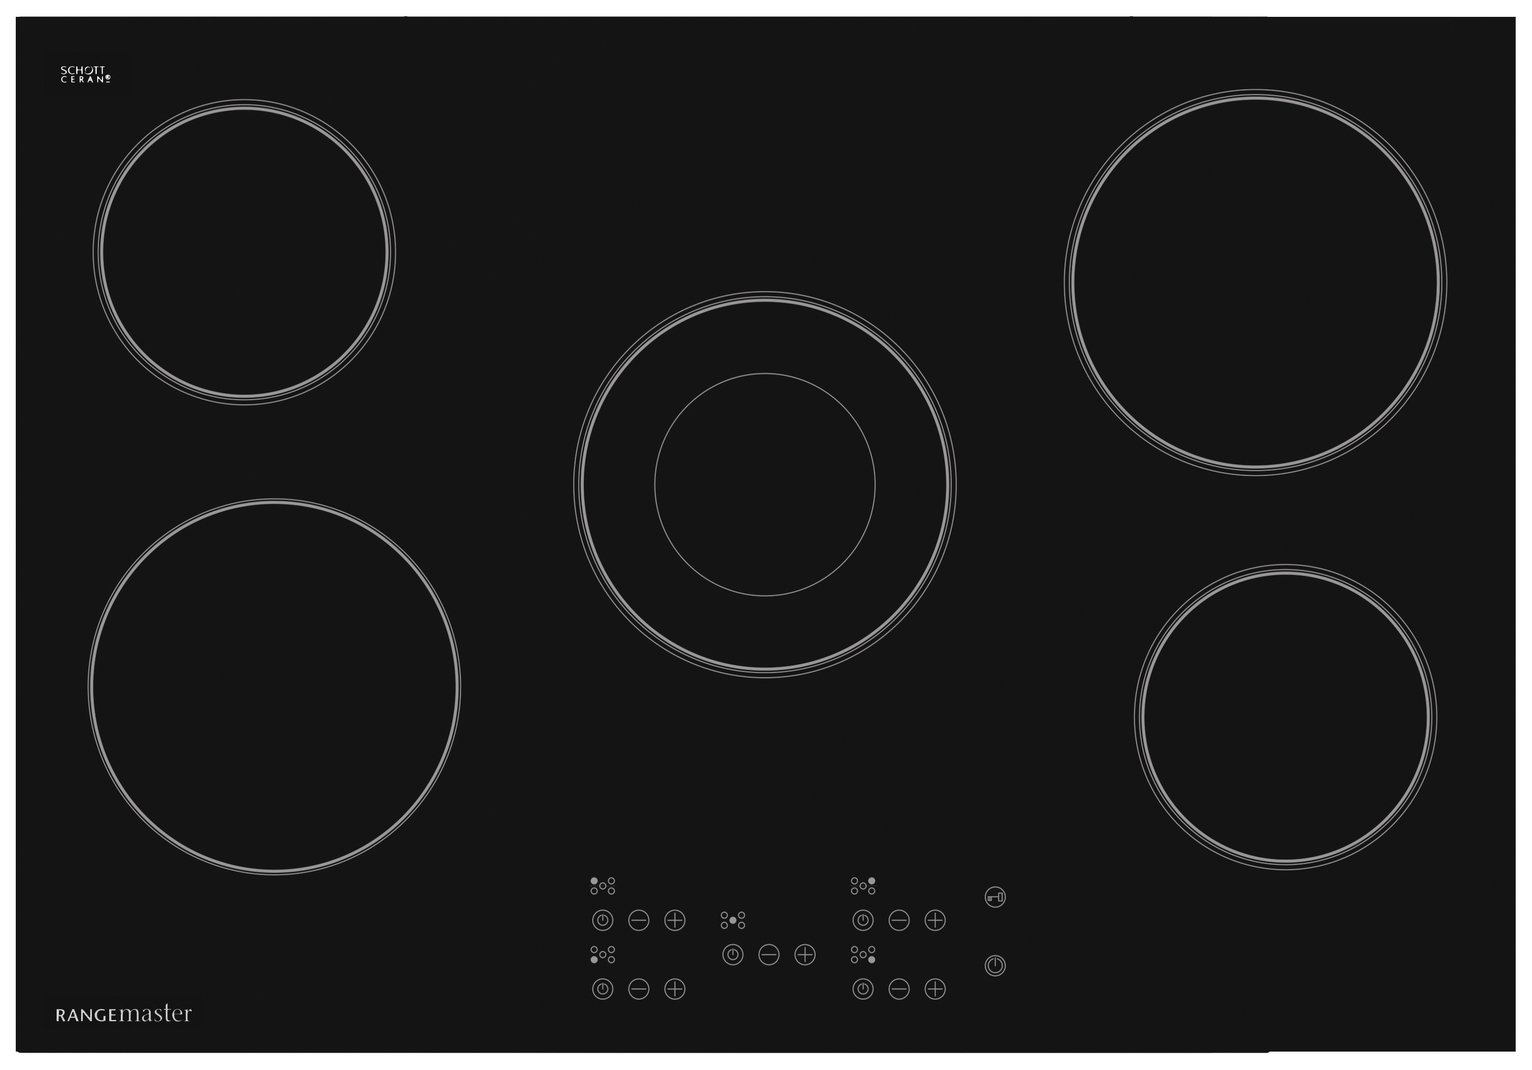 Rangemaster - 5 Zone - Ceramic Hob - Black